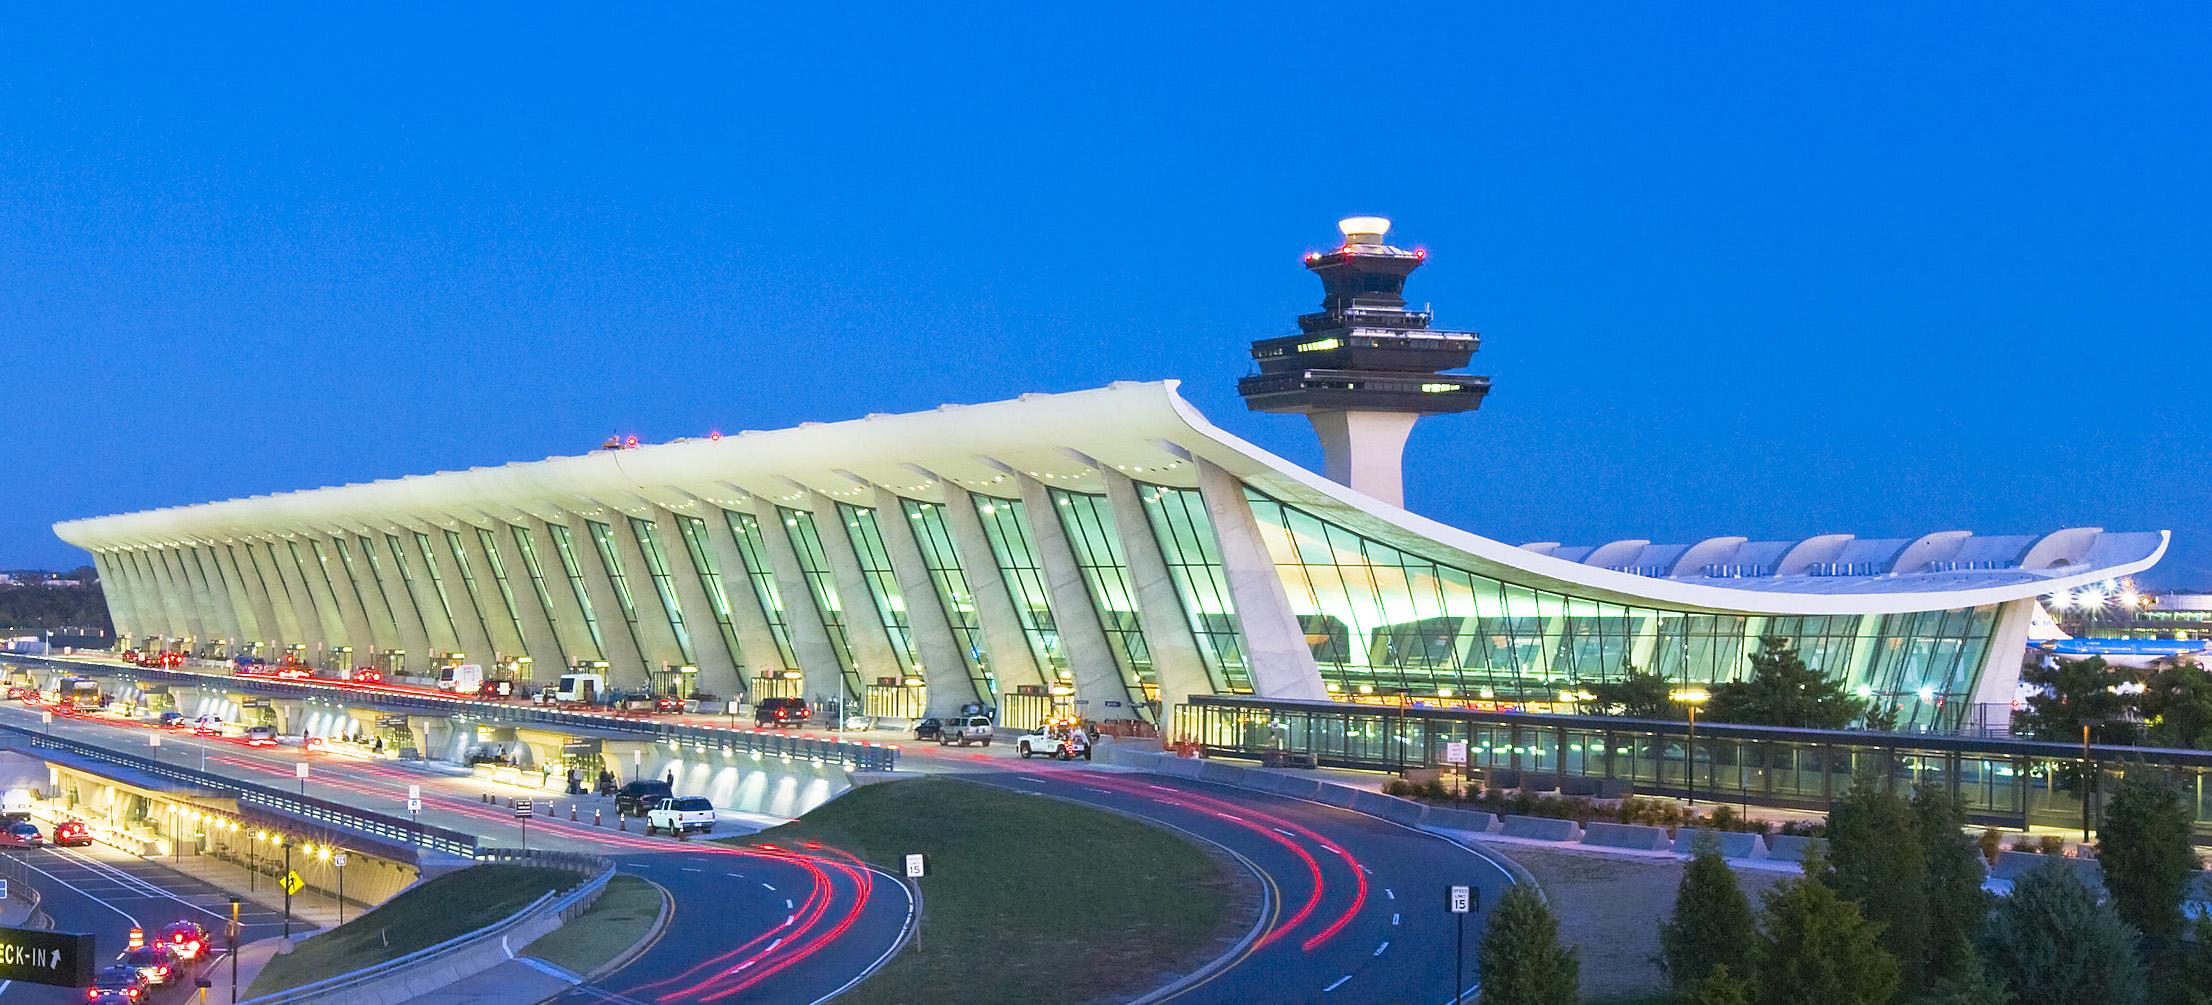 Dulles International Airport (IAD)